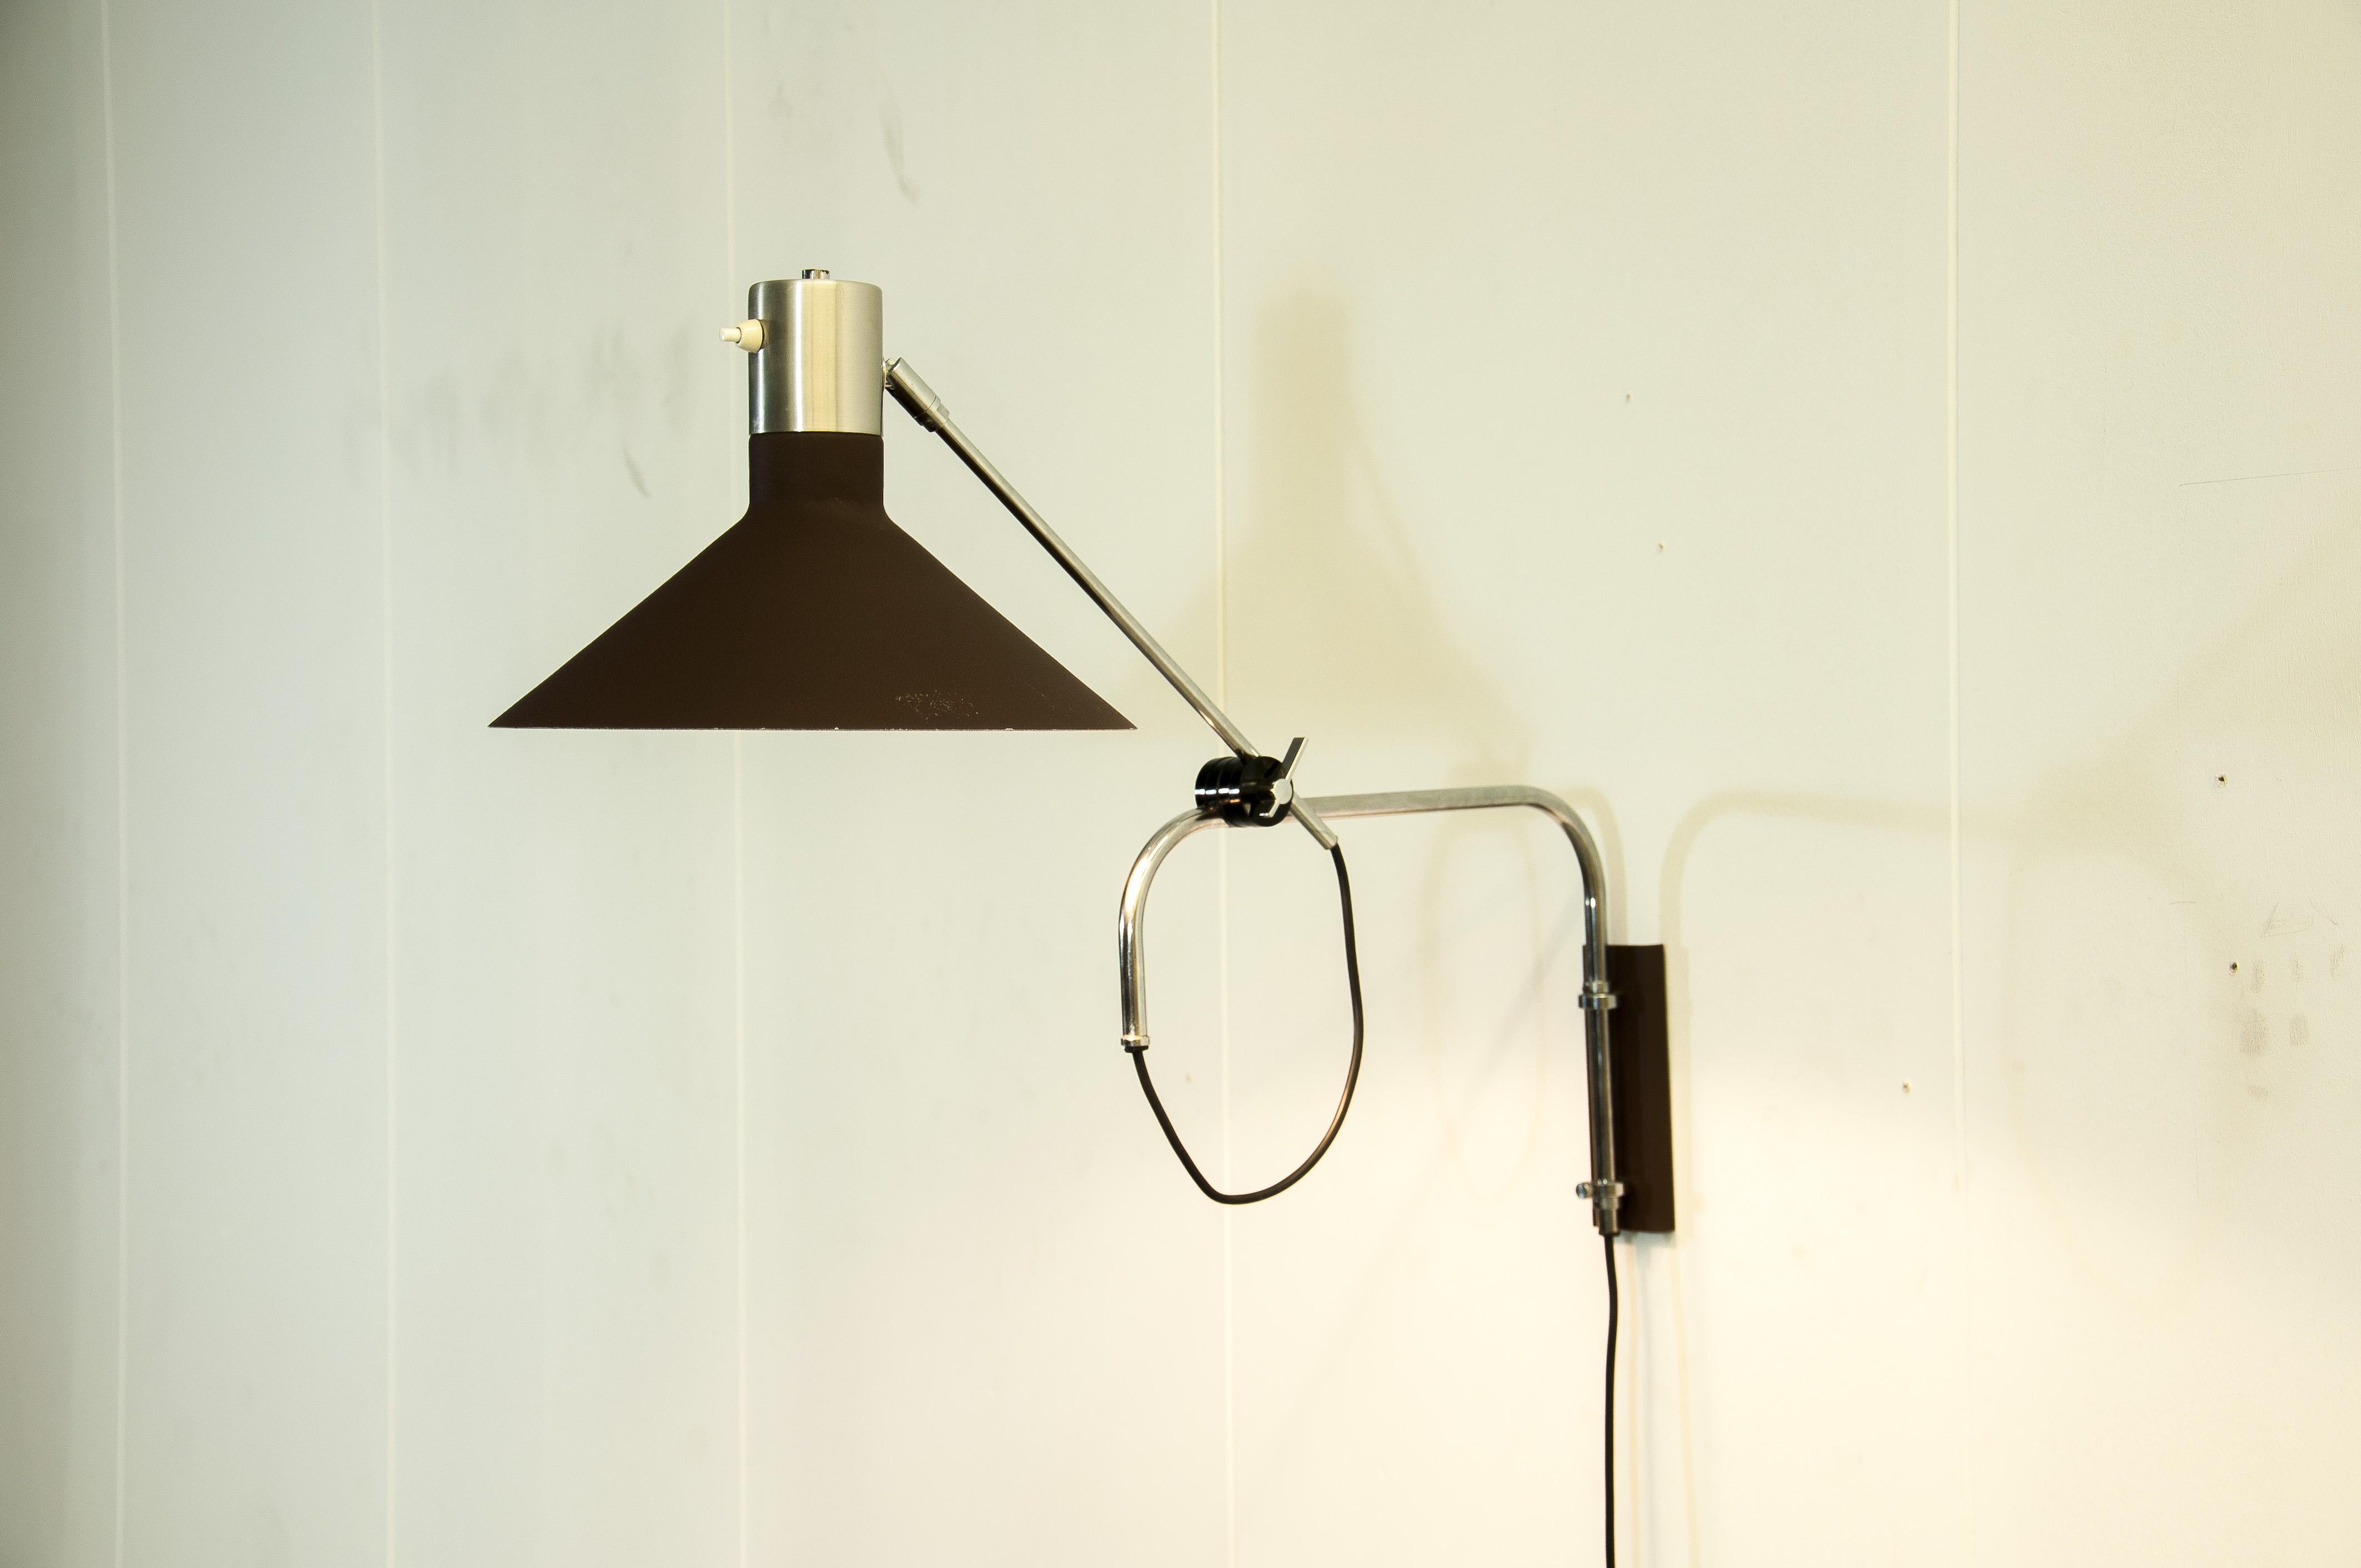 VINTAGE ANVIA WALL LAMP